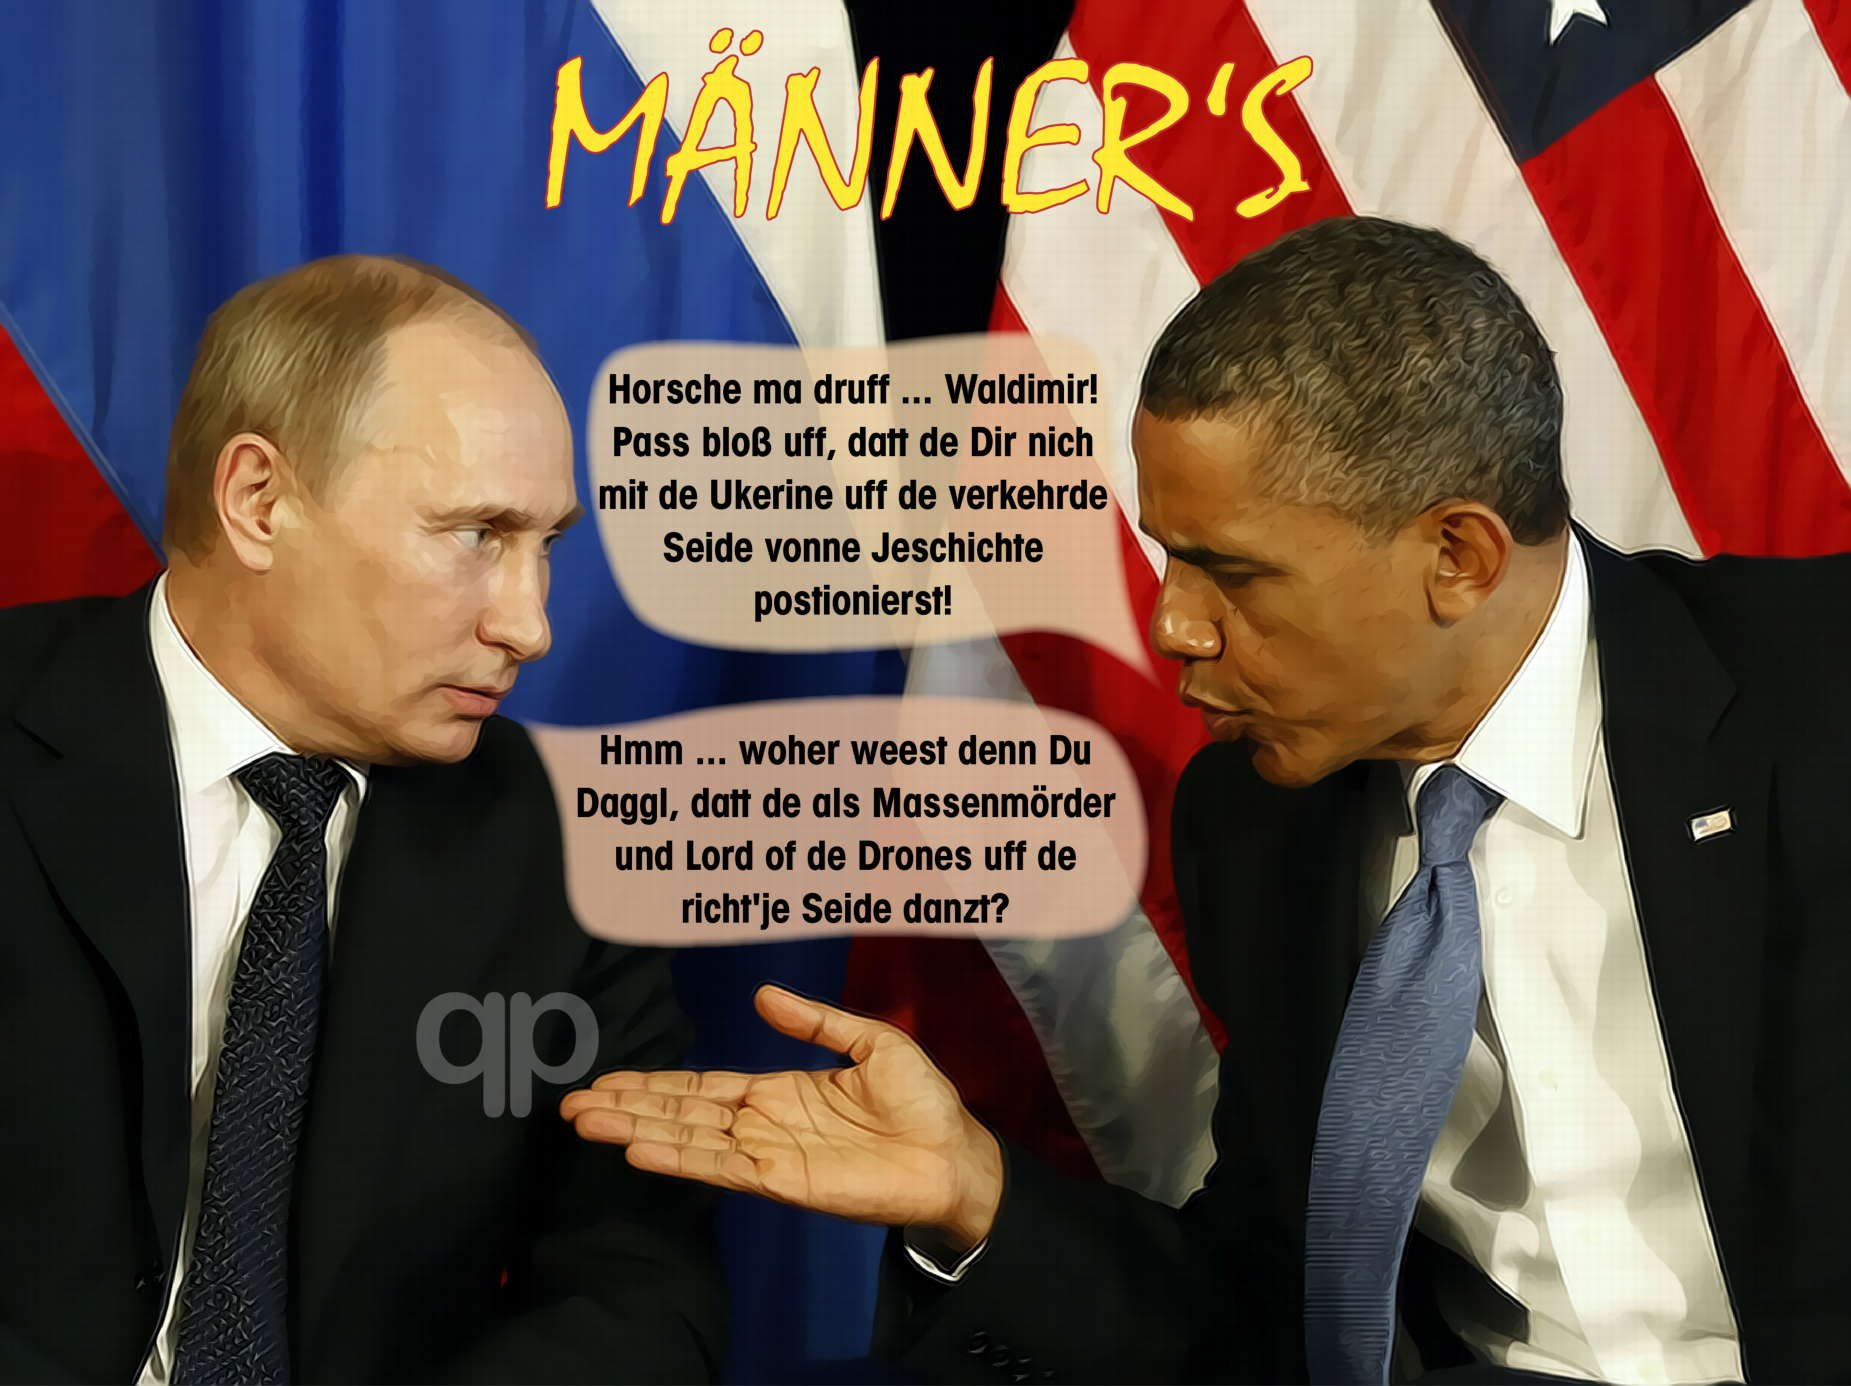 Putin obama mens talk about ukraine and history Kopie